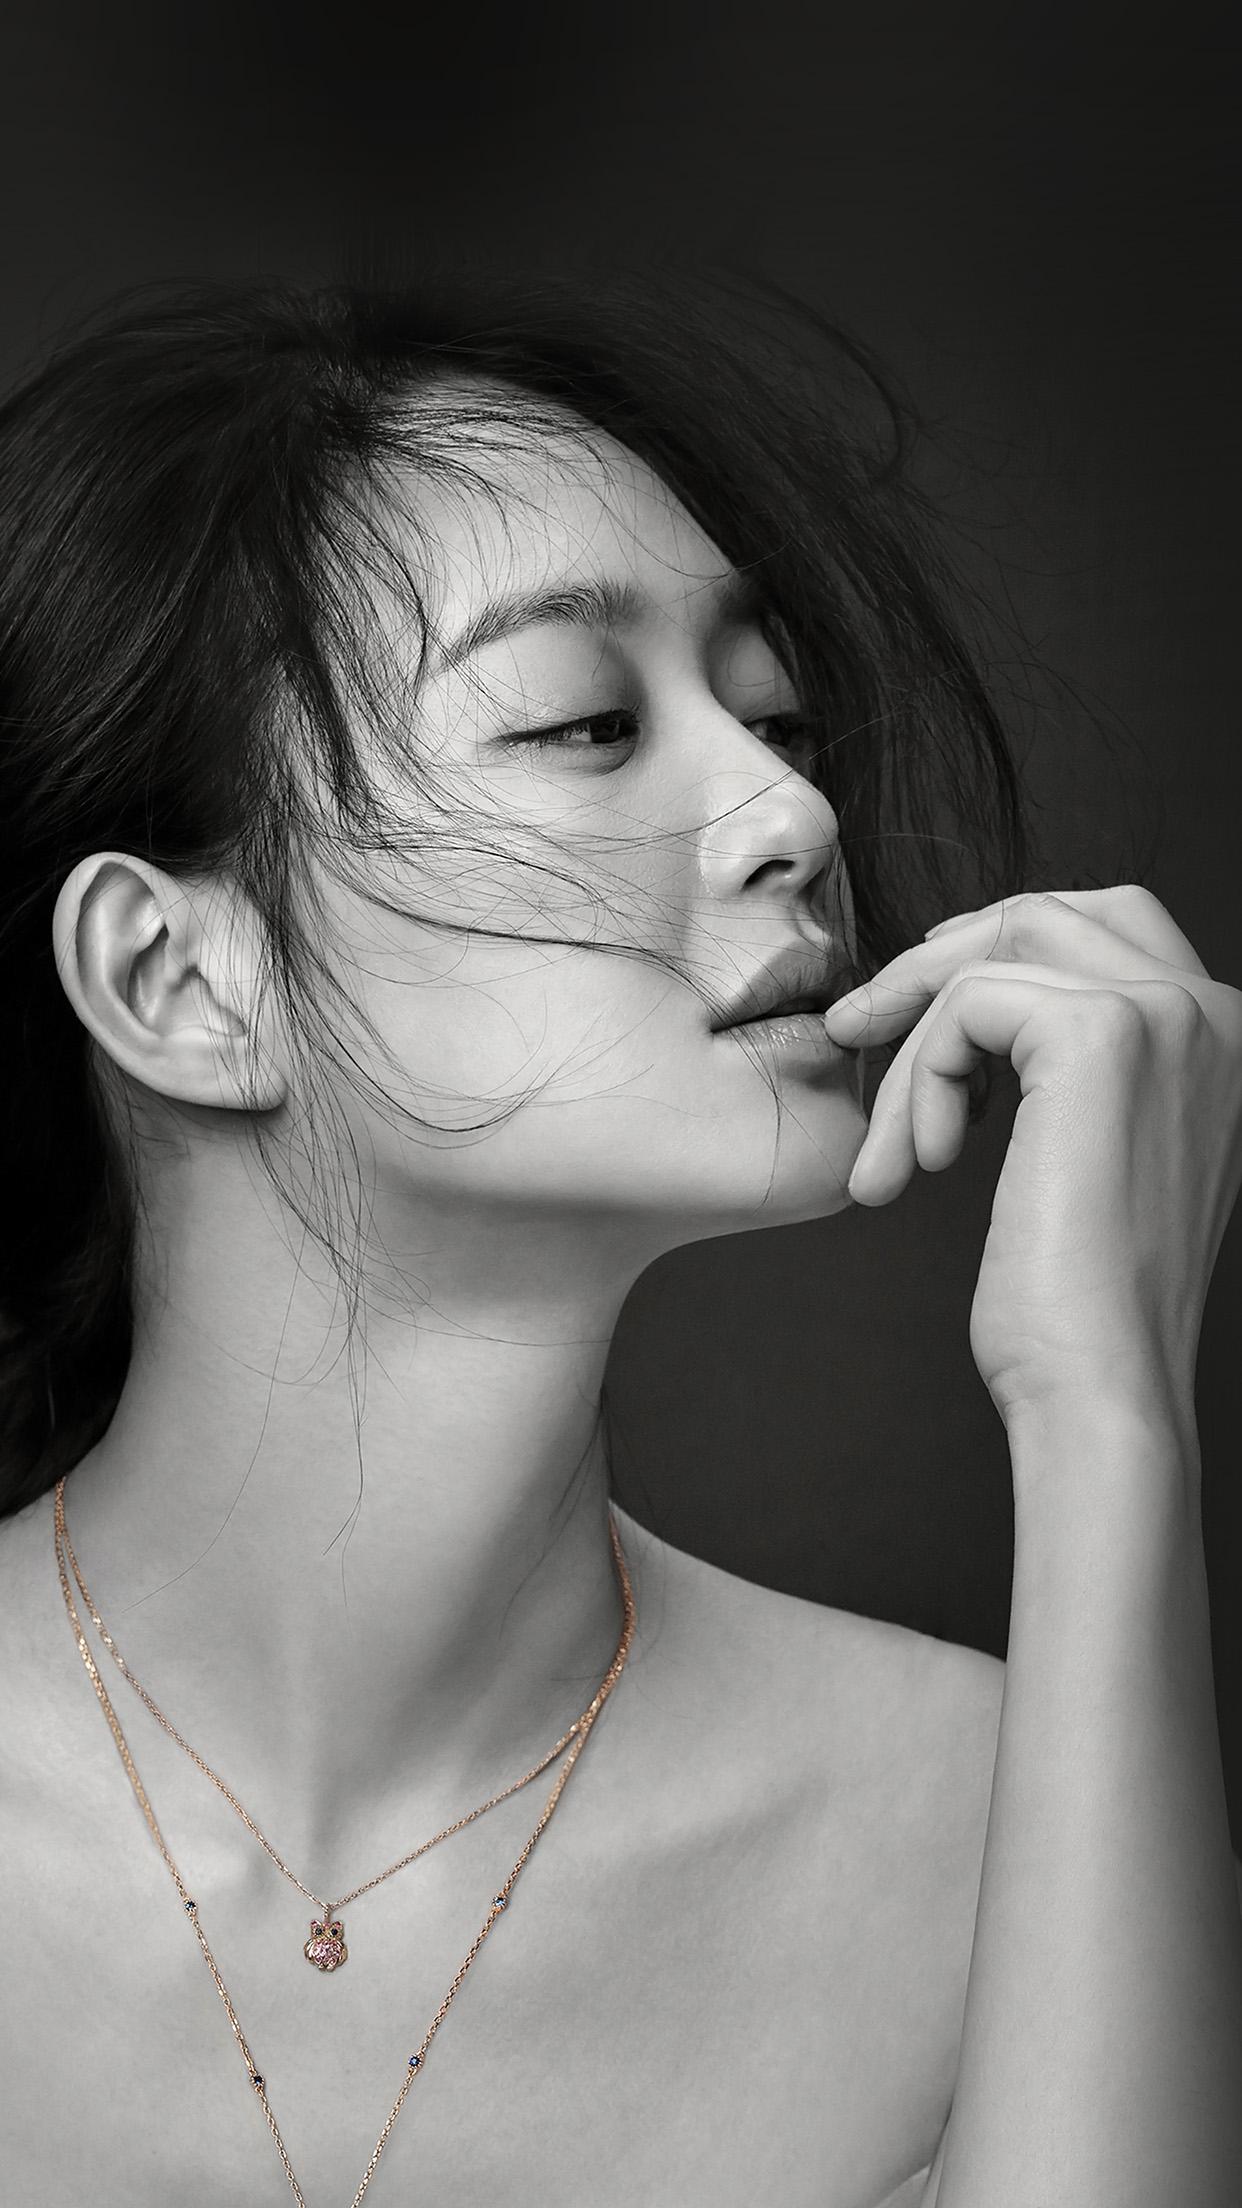 Bw Kpop Girl Shin Mina Android Wallpaper